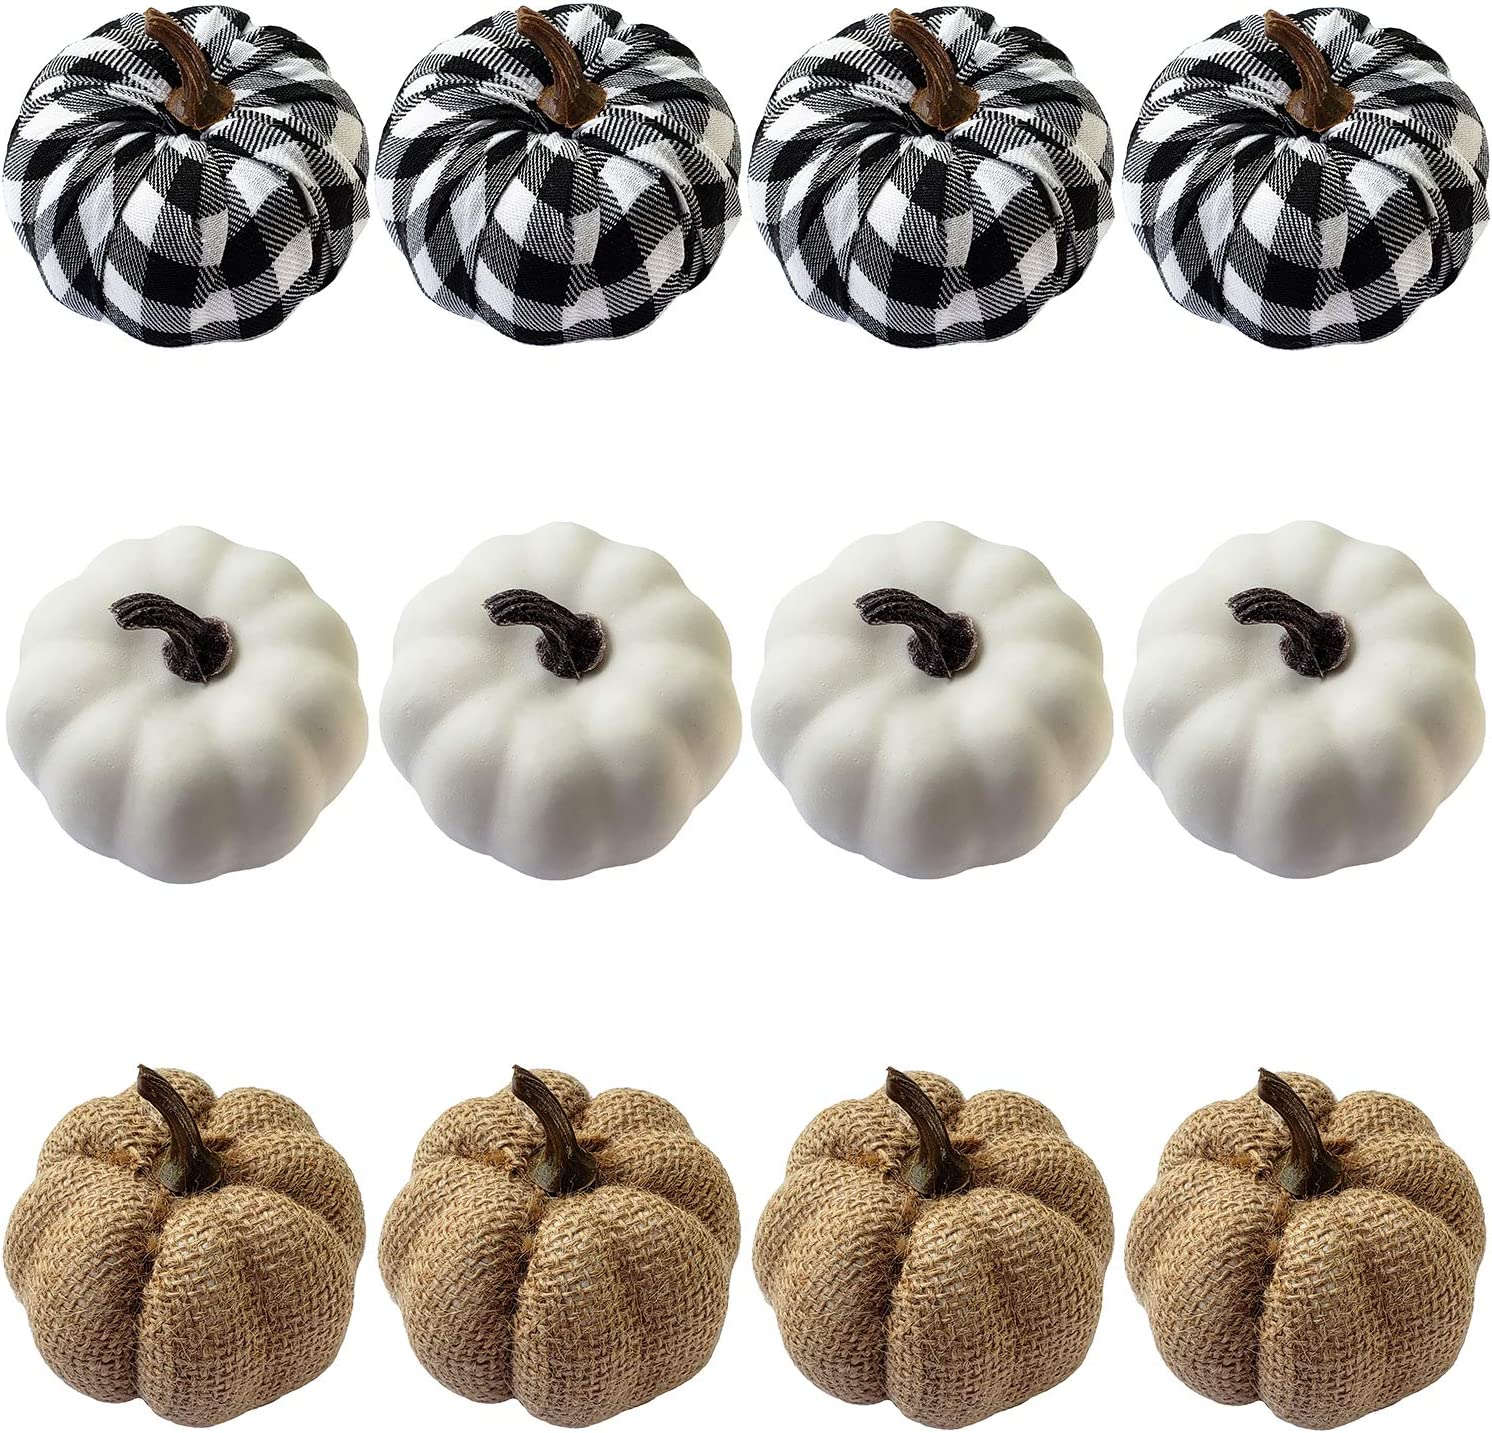 WsCrofts 12Pcs Artificial Pumpkins Set, White